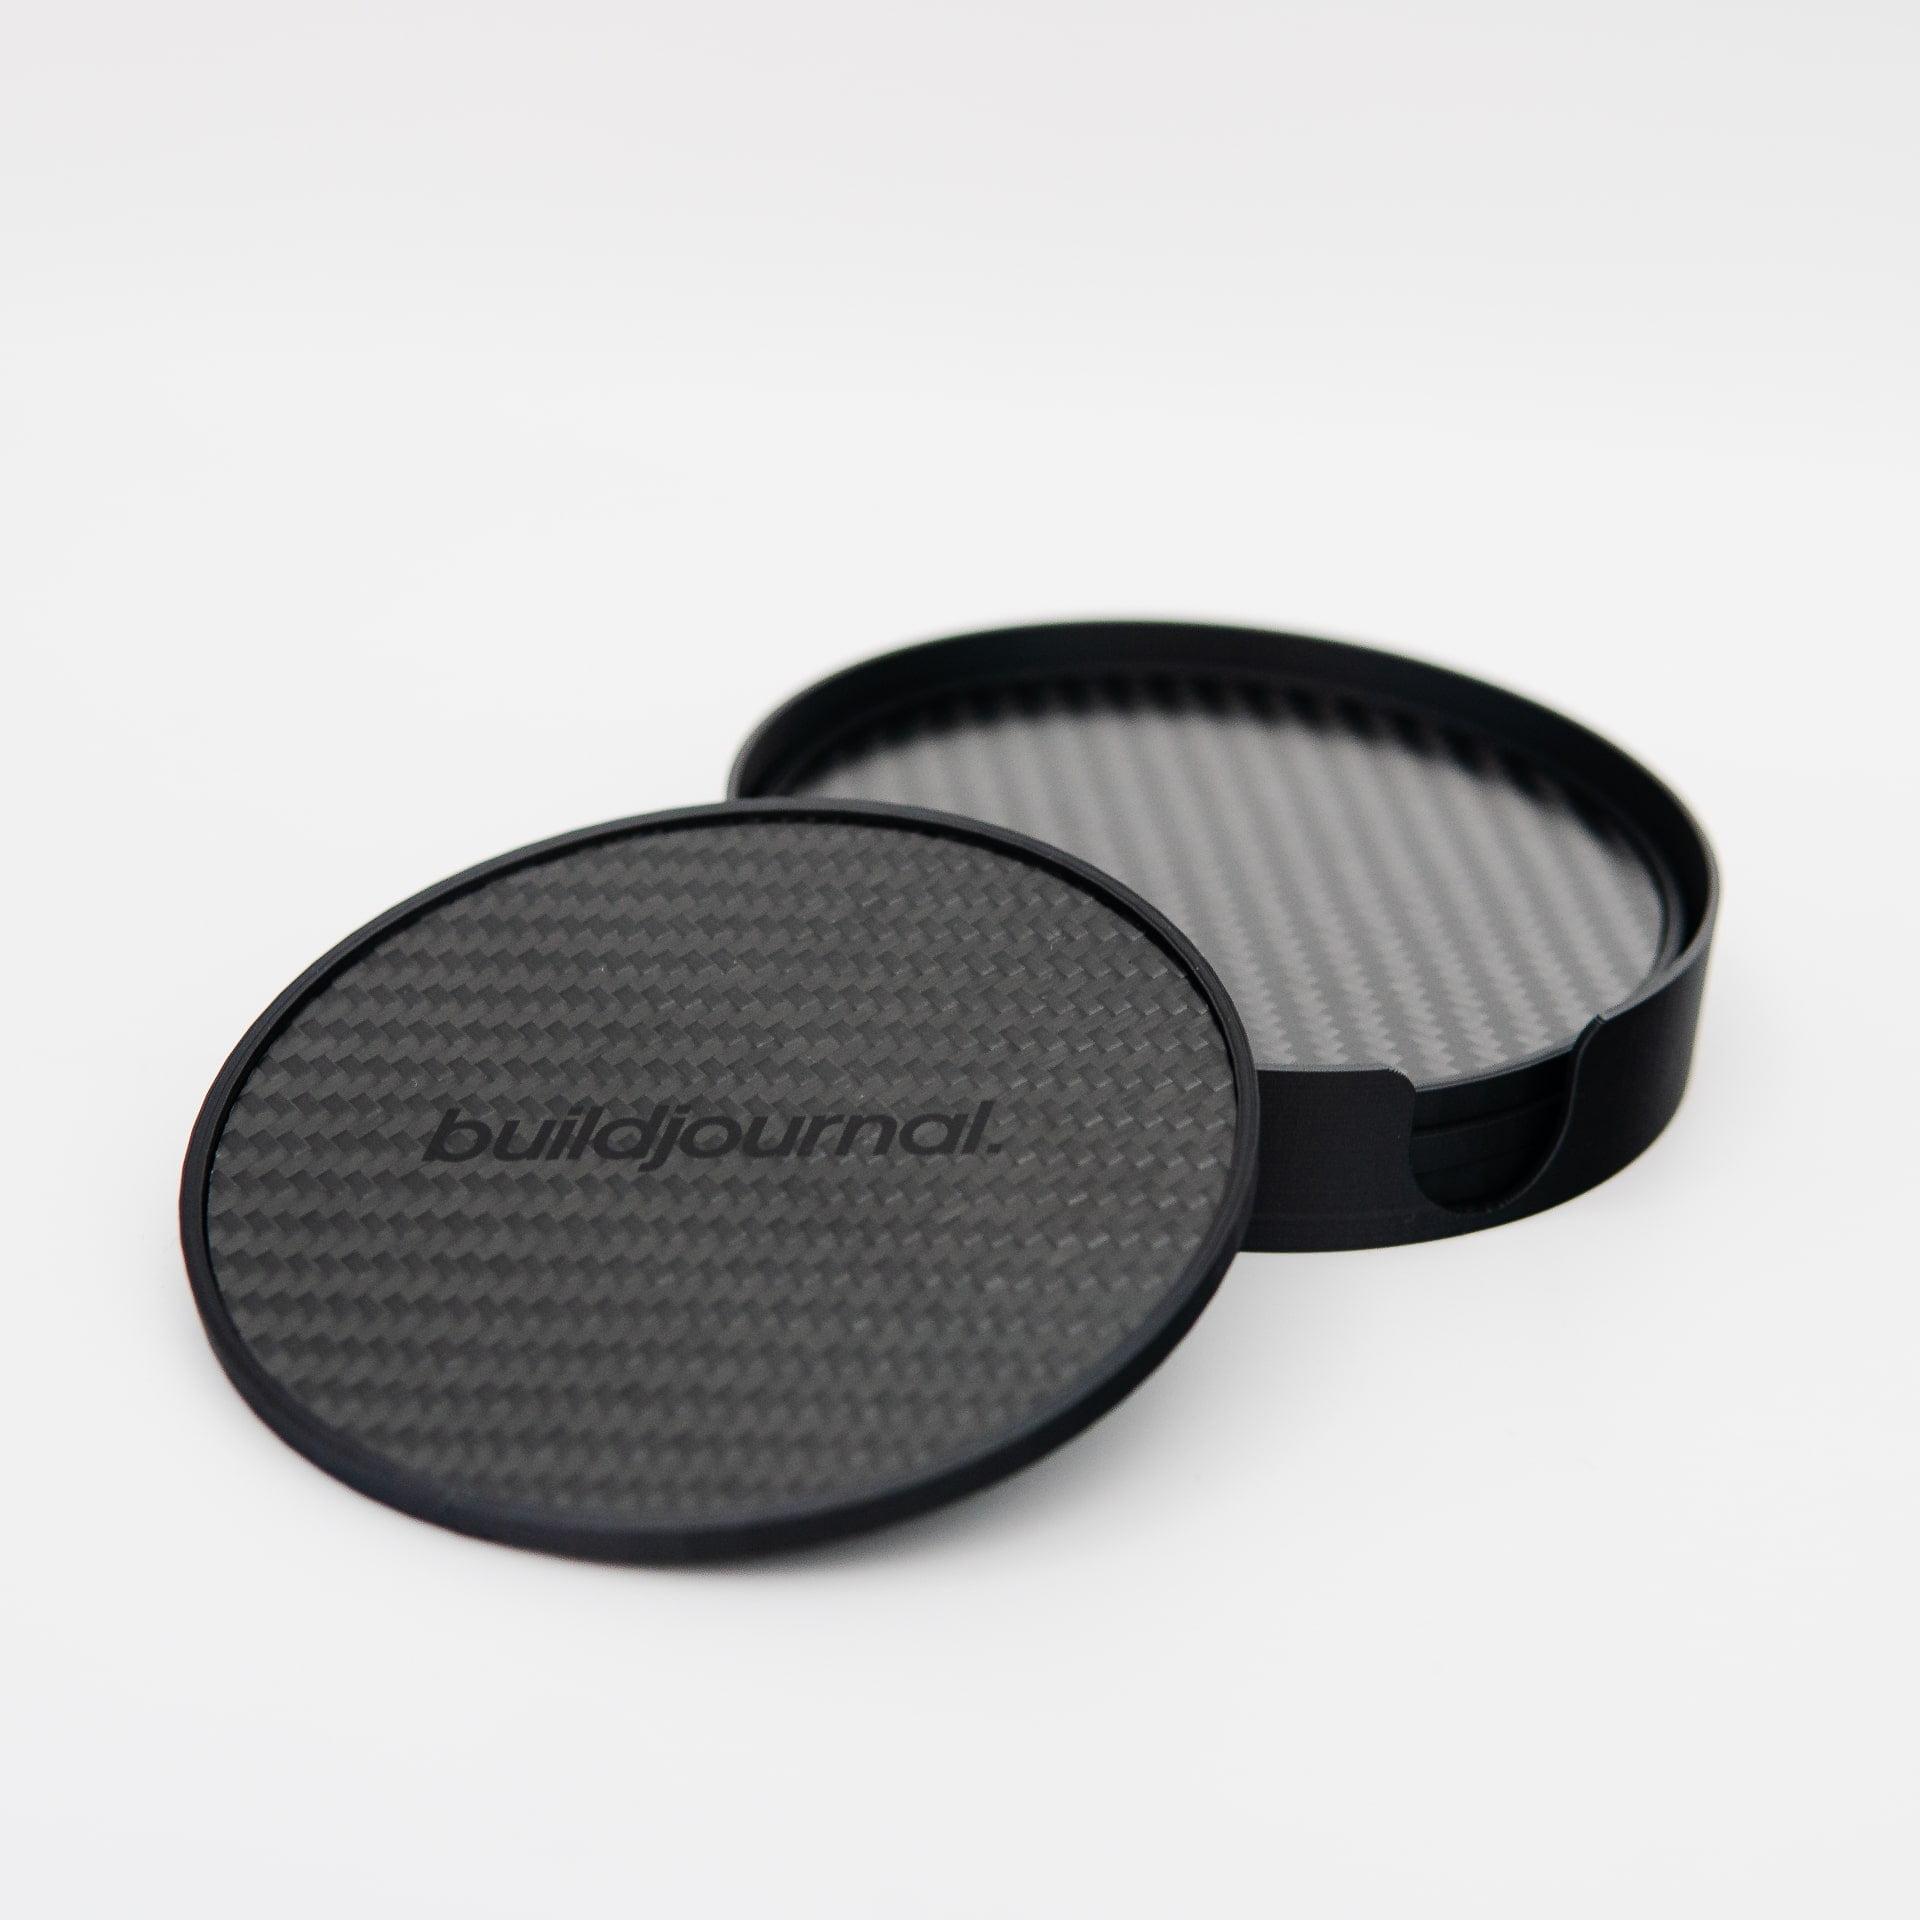 Carbon Fiber Coasters - Buildjournal